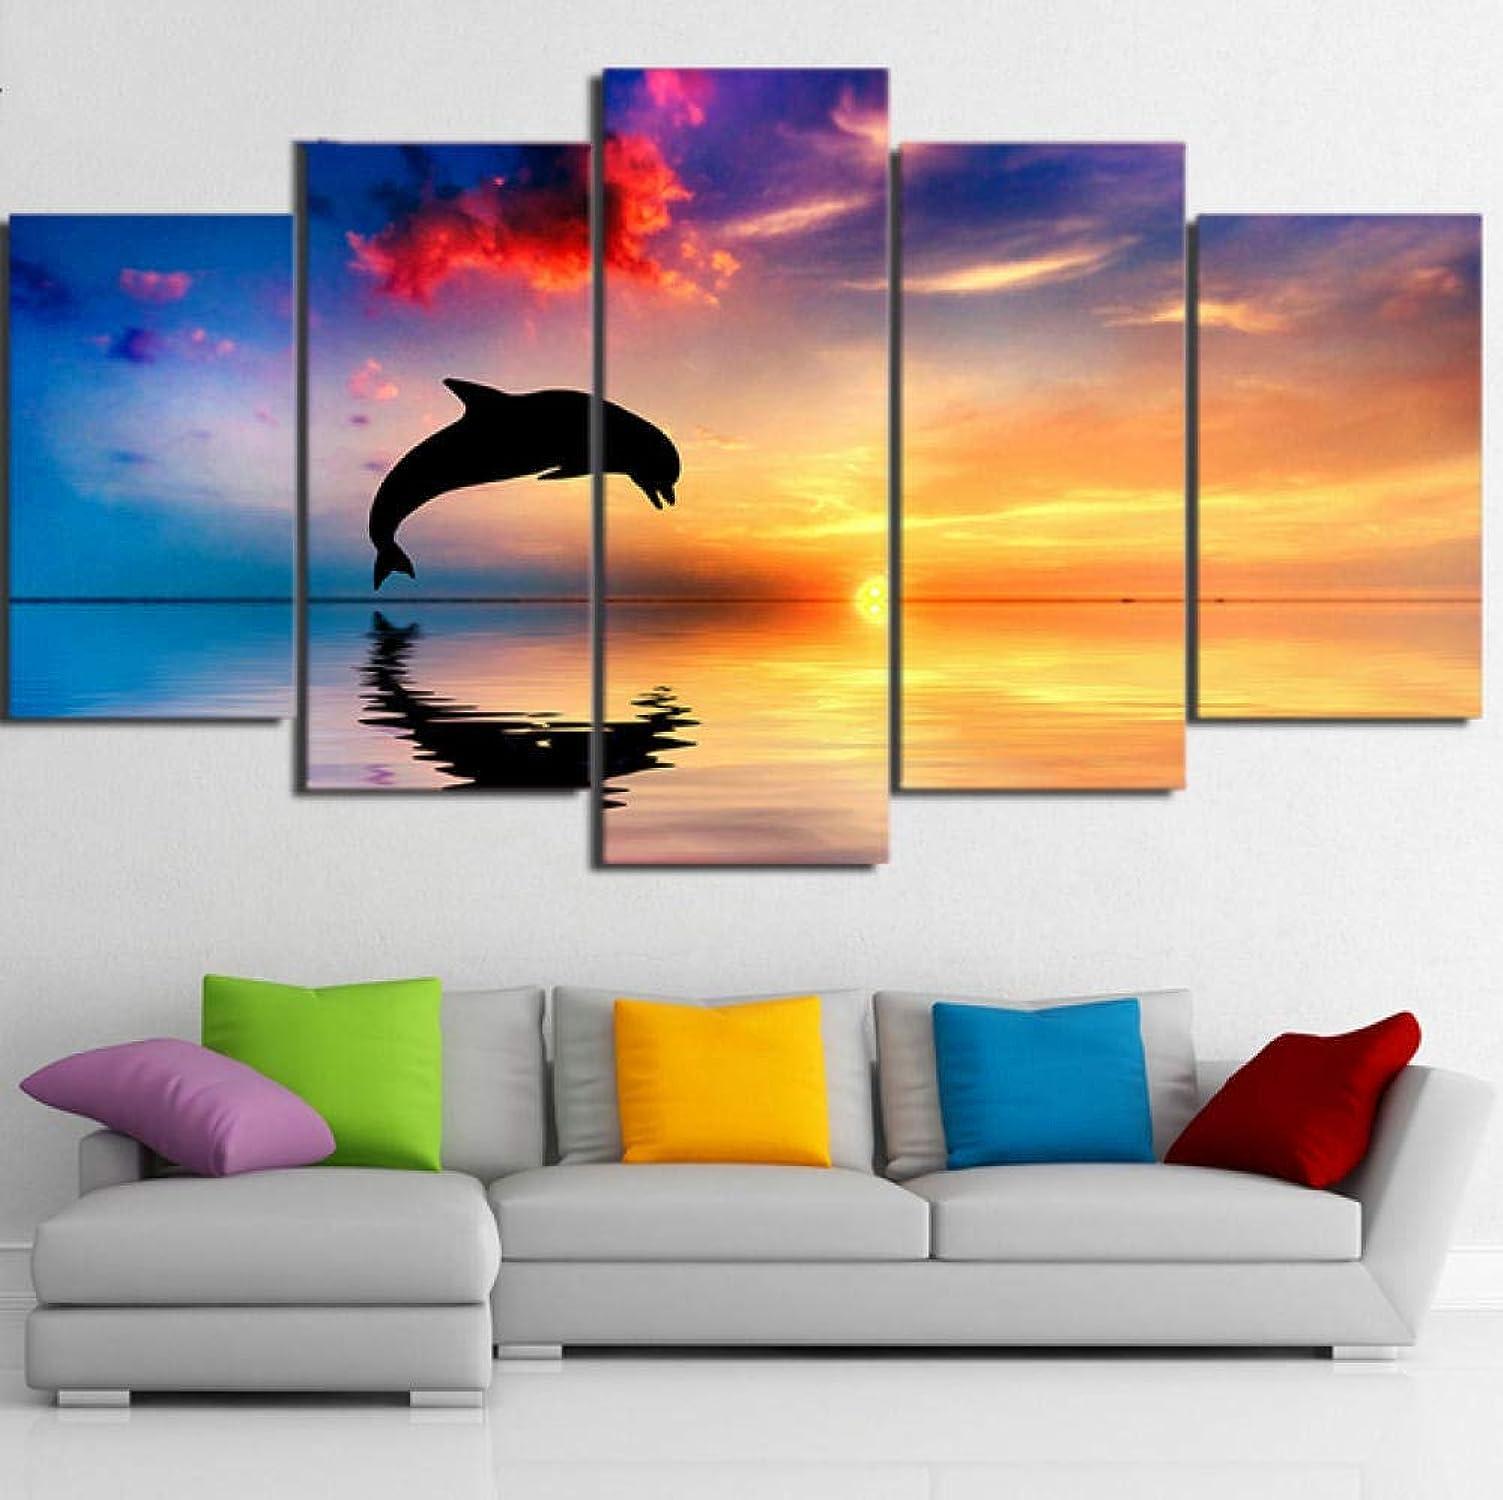 popular Tengya Wall Art Art Art HD Impreso Lienzo 5 Panel Dolphin Sunset Paisaje Decoración del Hogar Pinturas Modernas Posters -Frame  selección larga